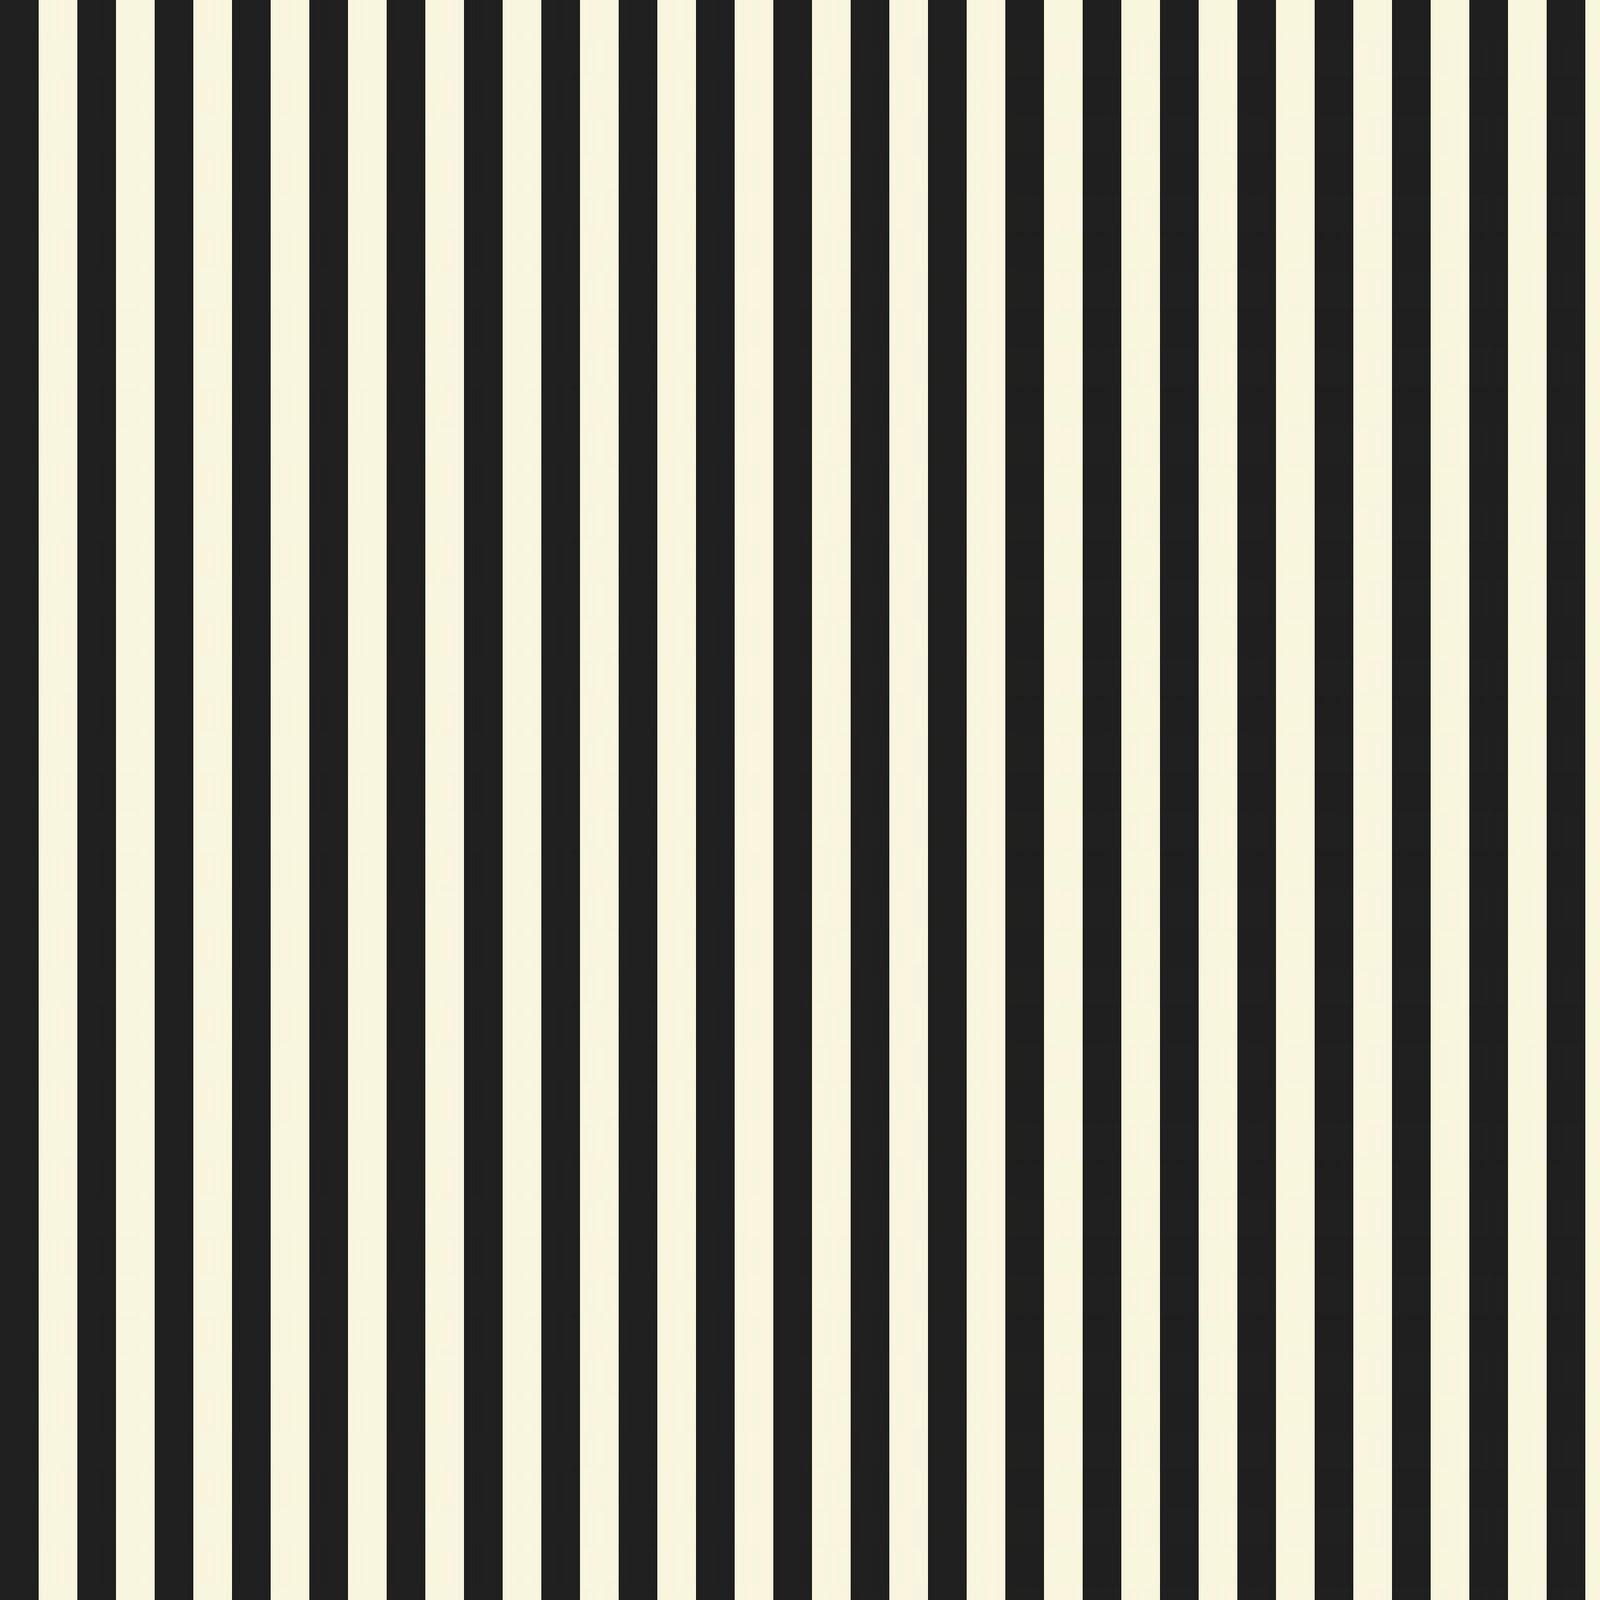 stripe paper stripes striped newspaper wallpapers digital definition wallpapersafari scrapbook 1600 versatile very save cream january